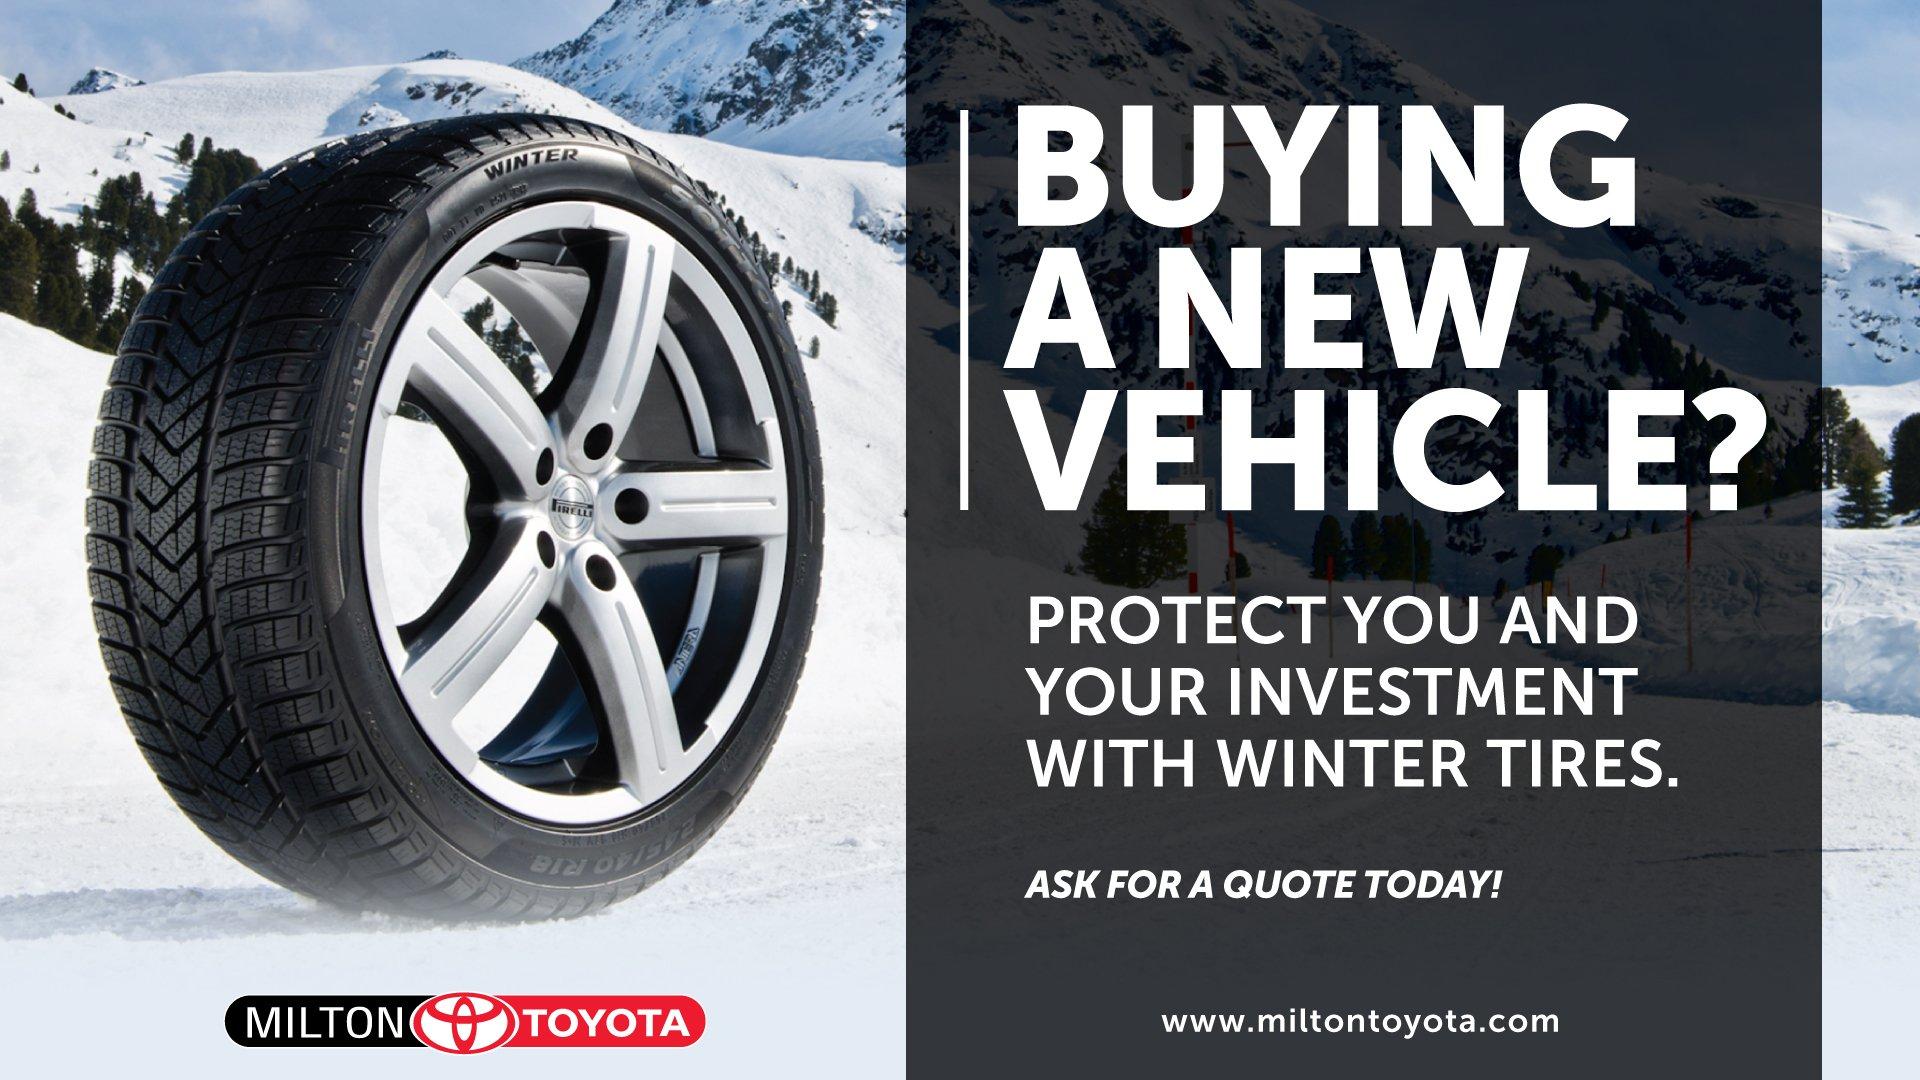 MT-Winter-Tires-1920X1080-2017